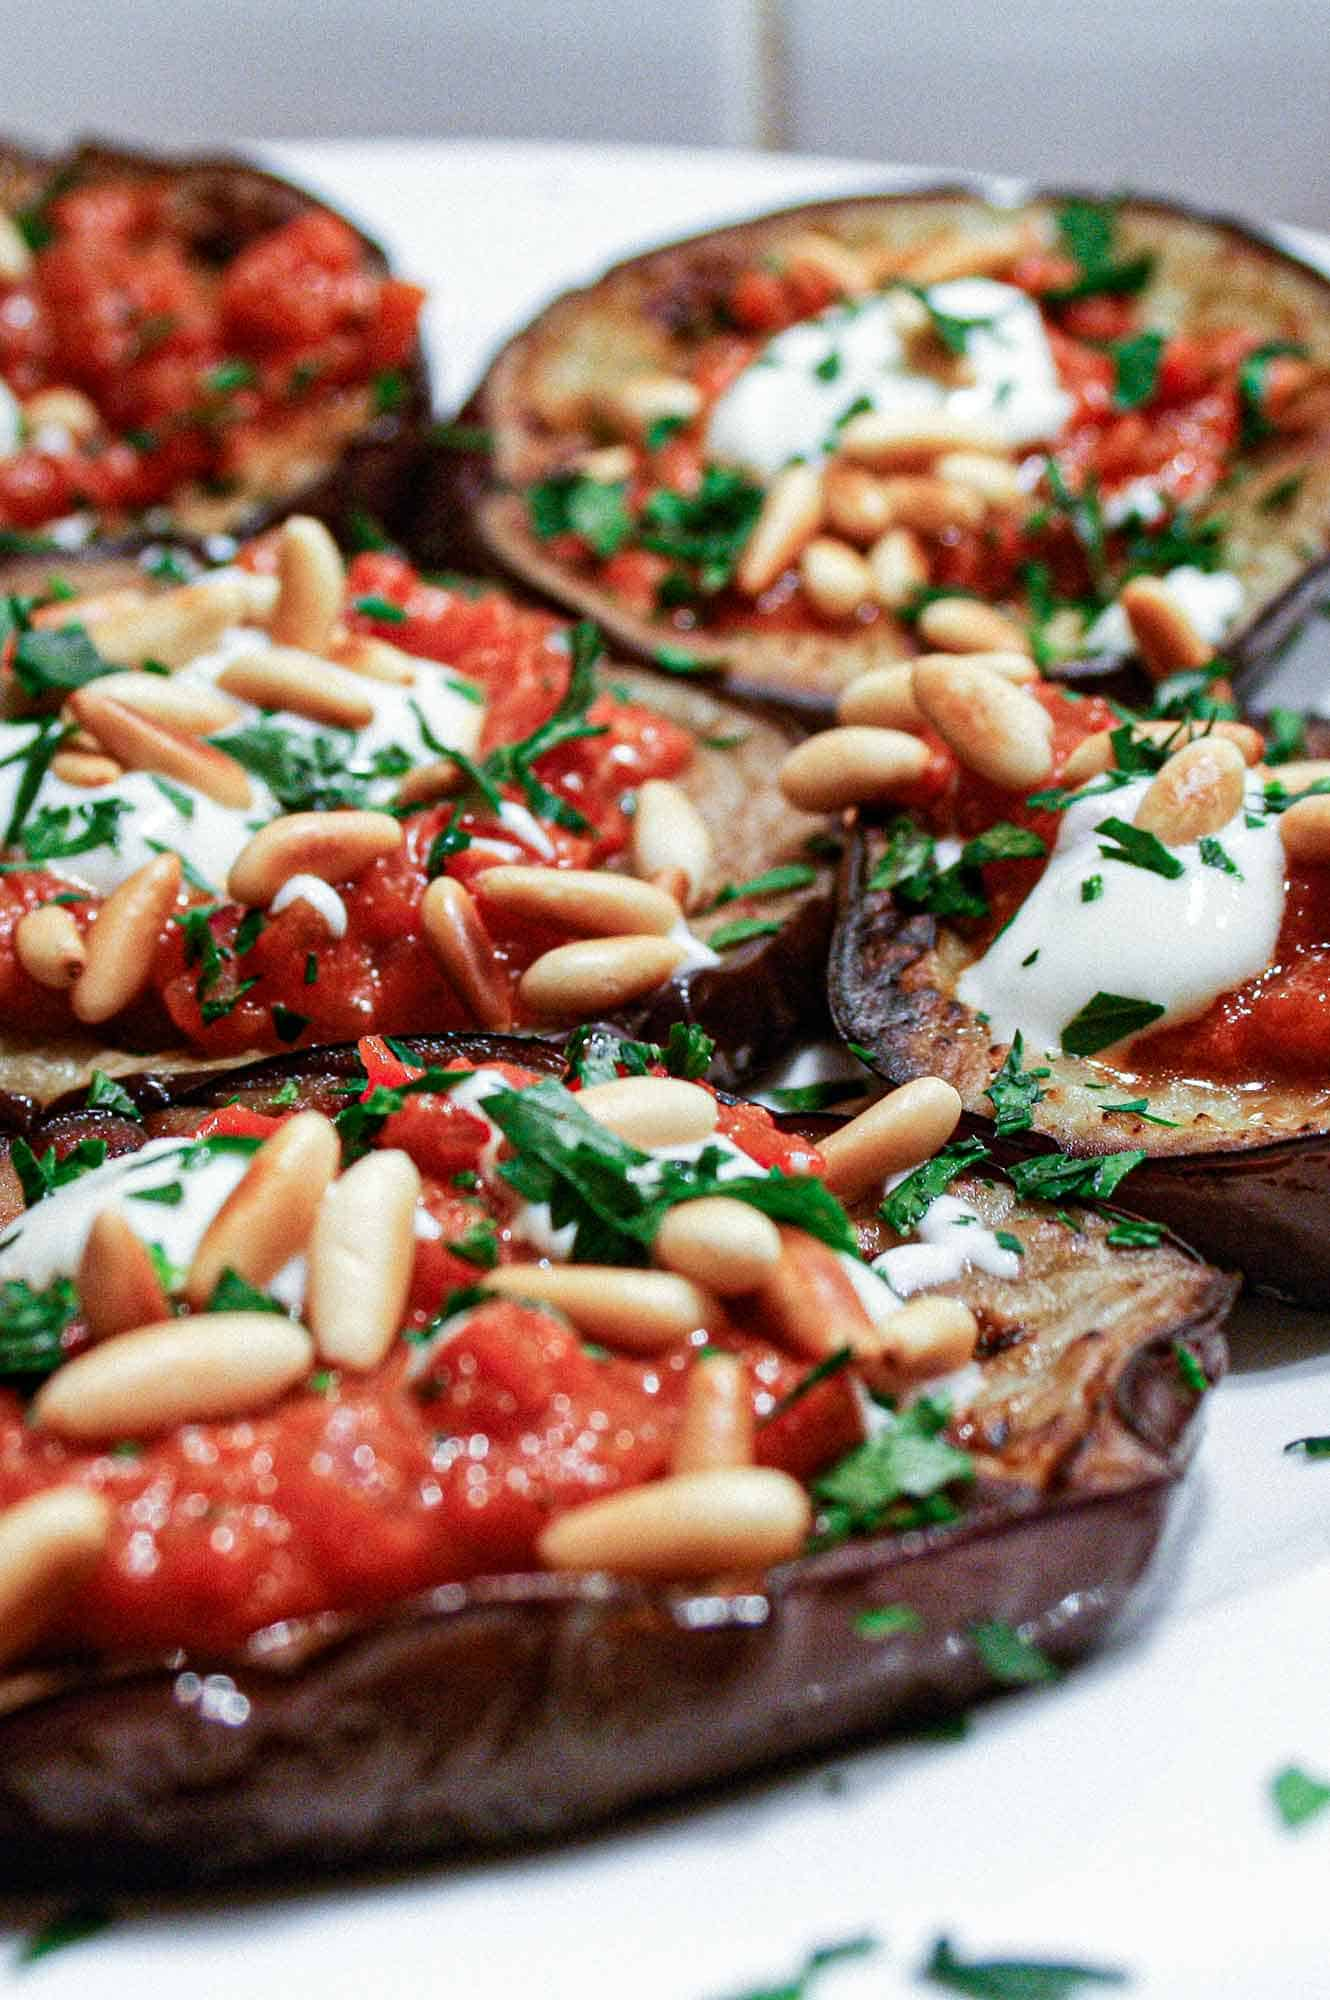 Eggplant With Tomato Sauce & Pine nuts